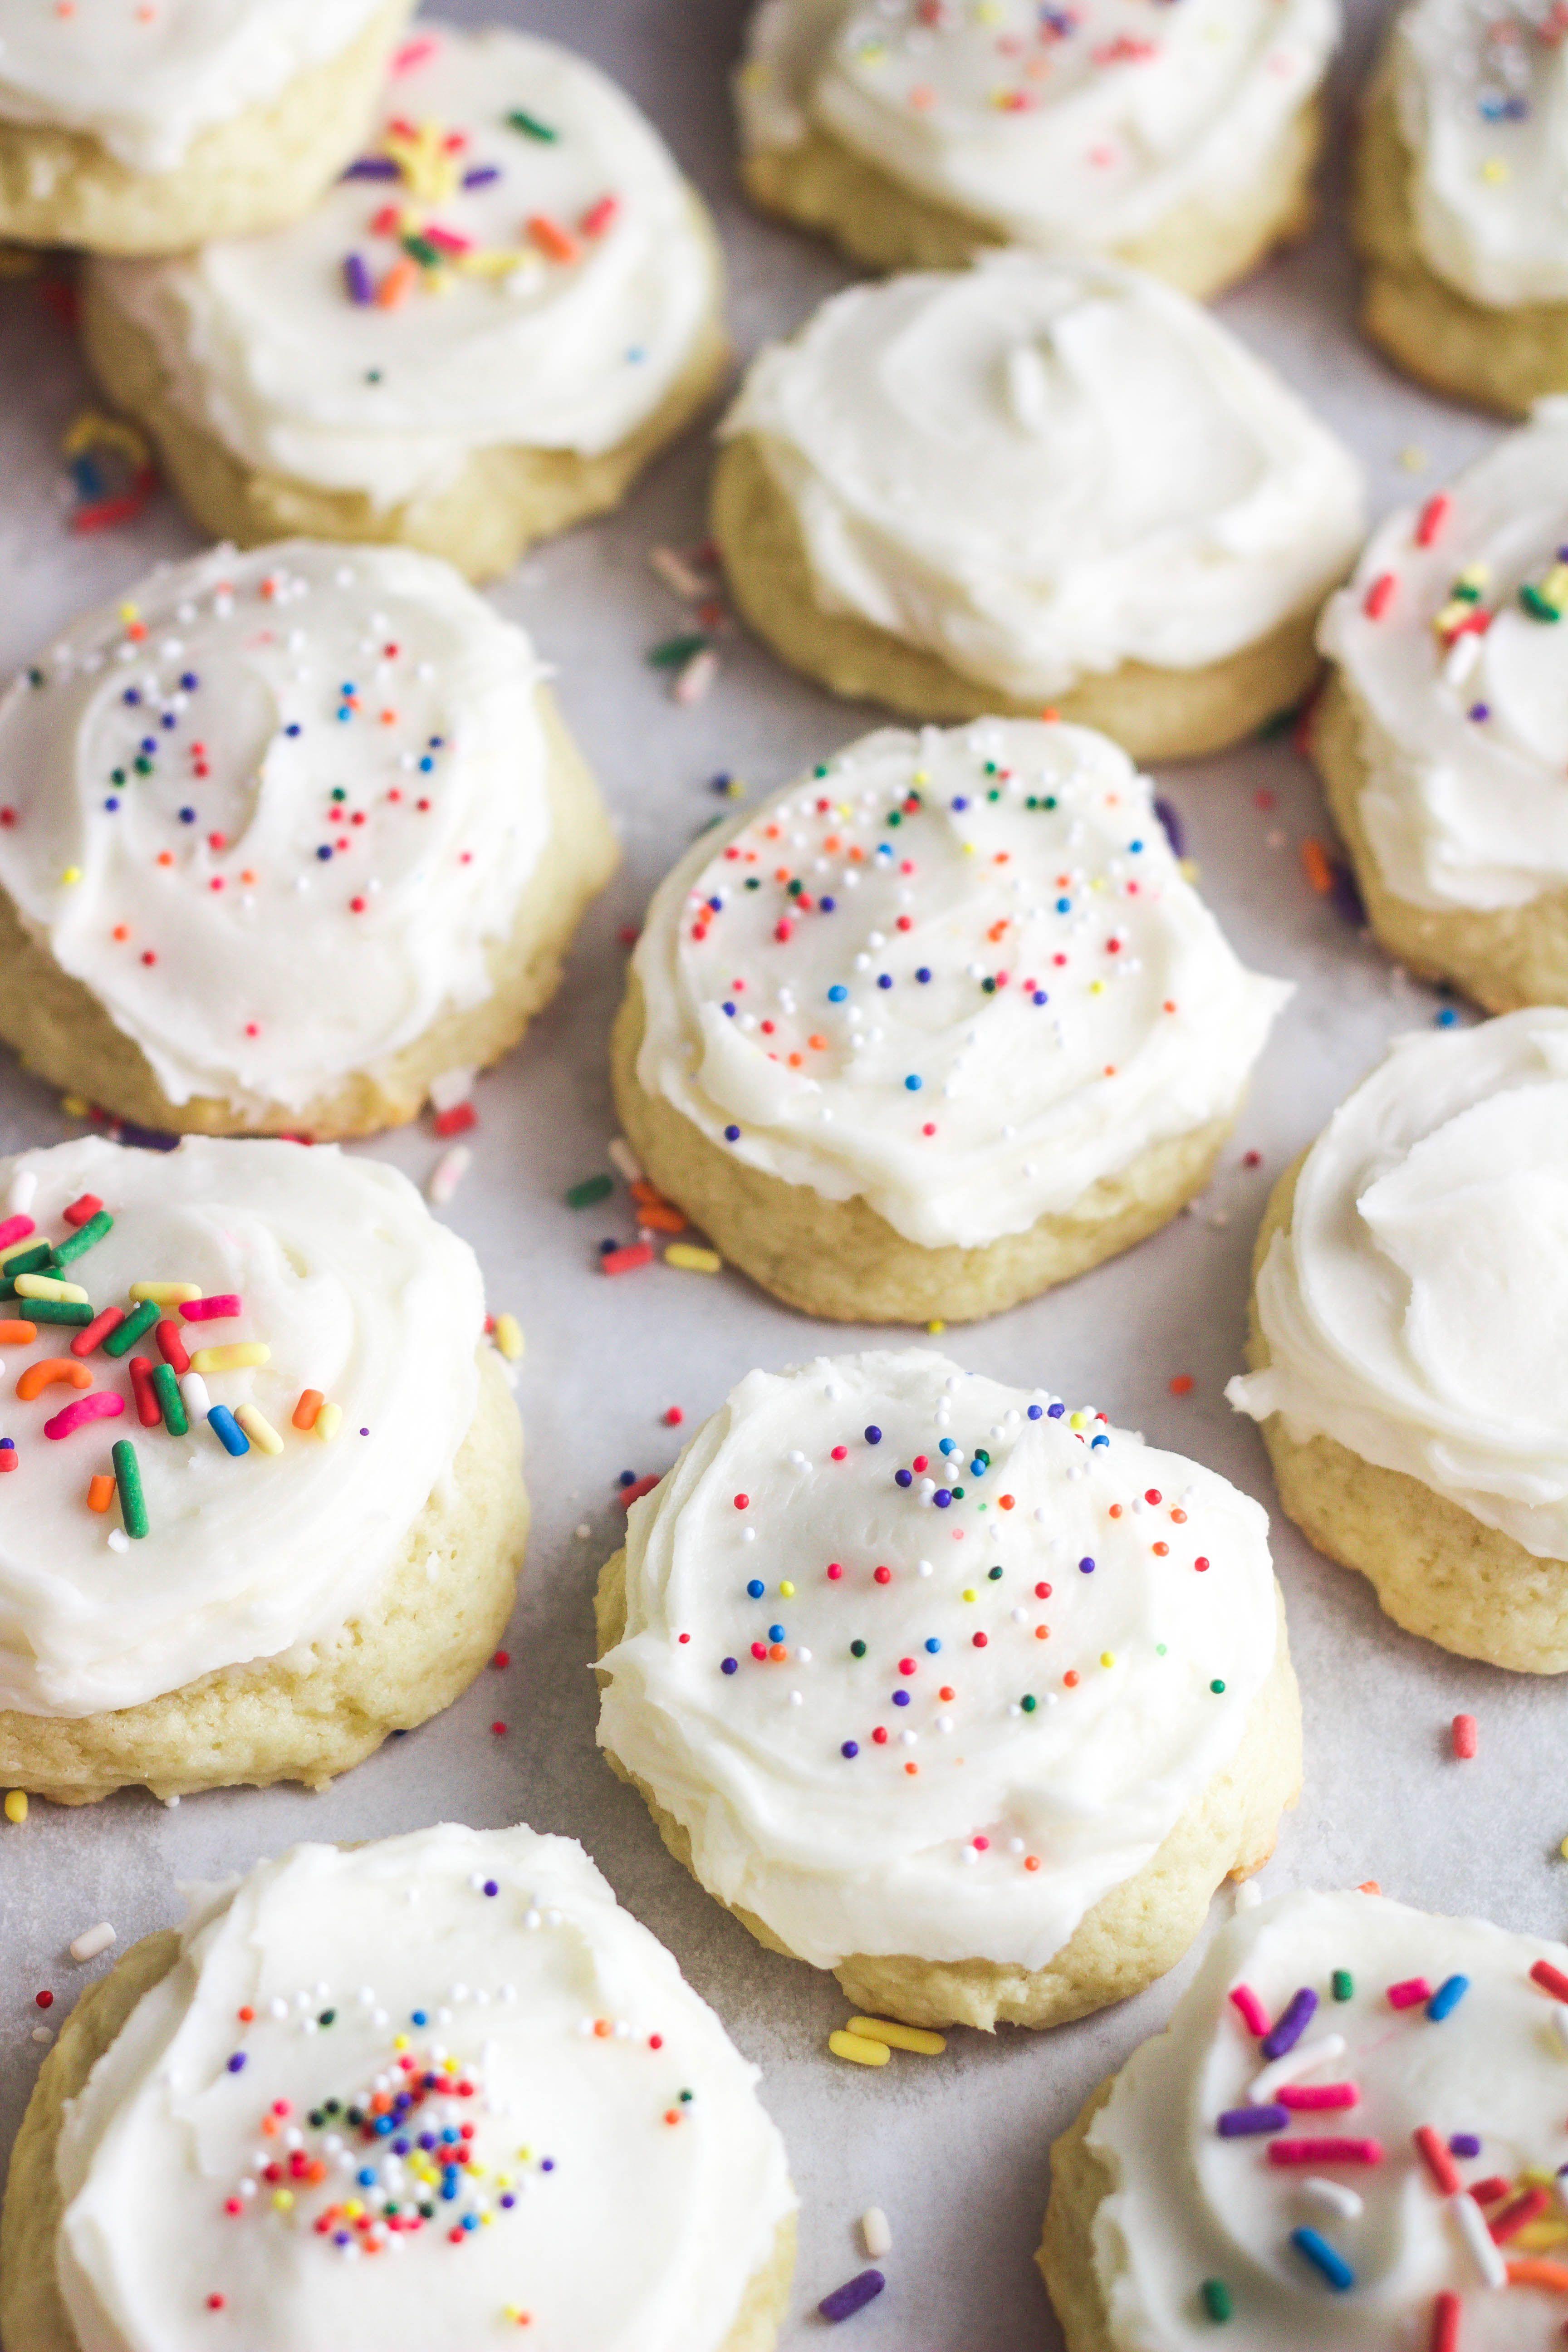 Buttermilk Cookies 5 Boys Baker Recipe Buttermilk Cookies Buttermilk Recipes Easy Baking Recipes Desserts